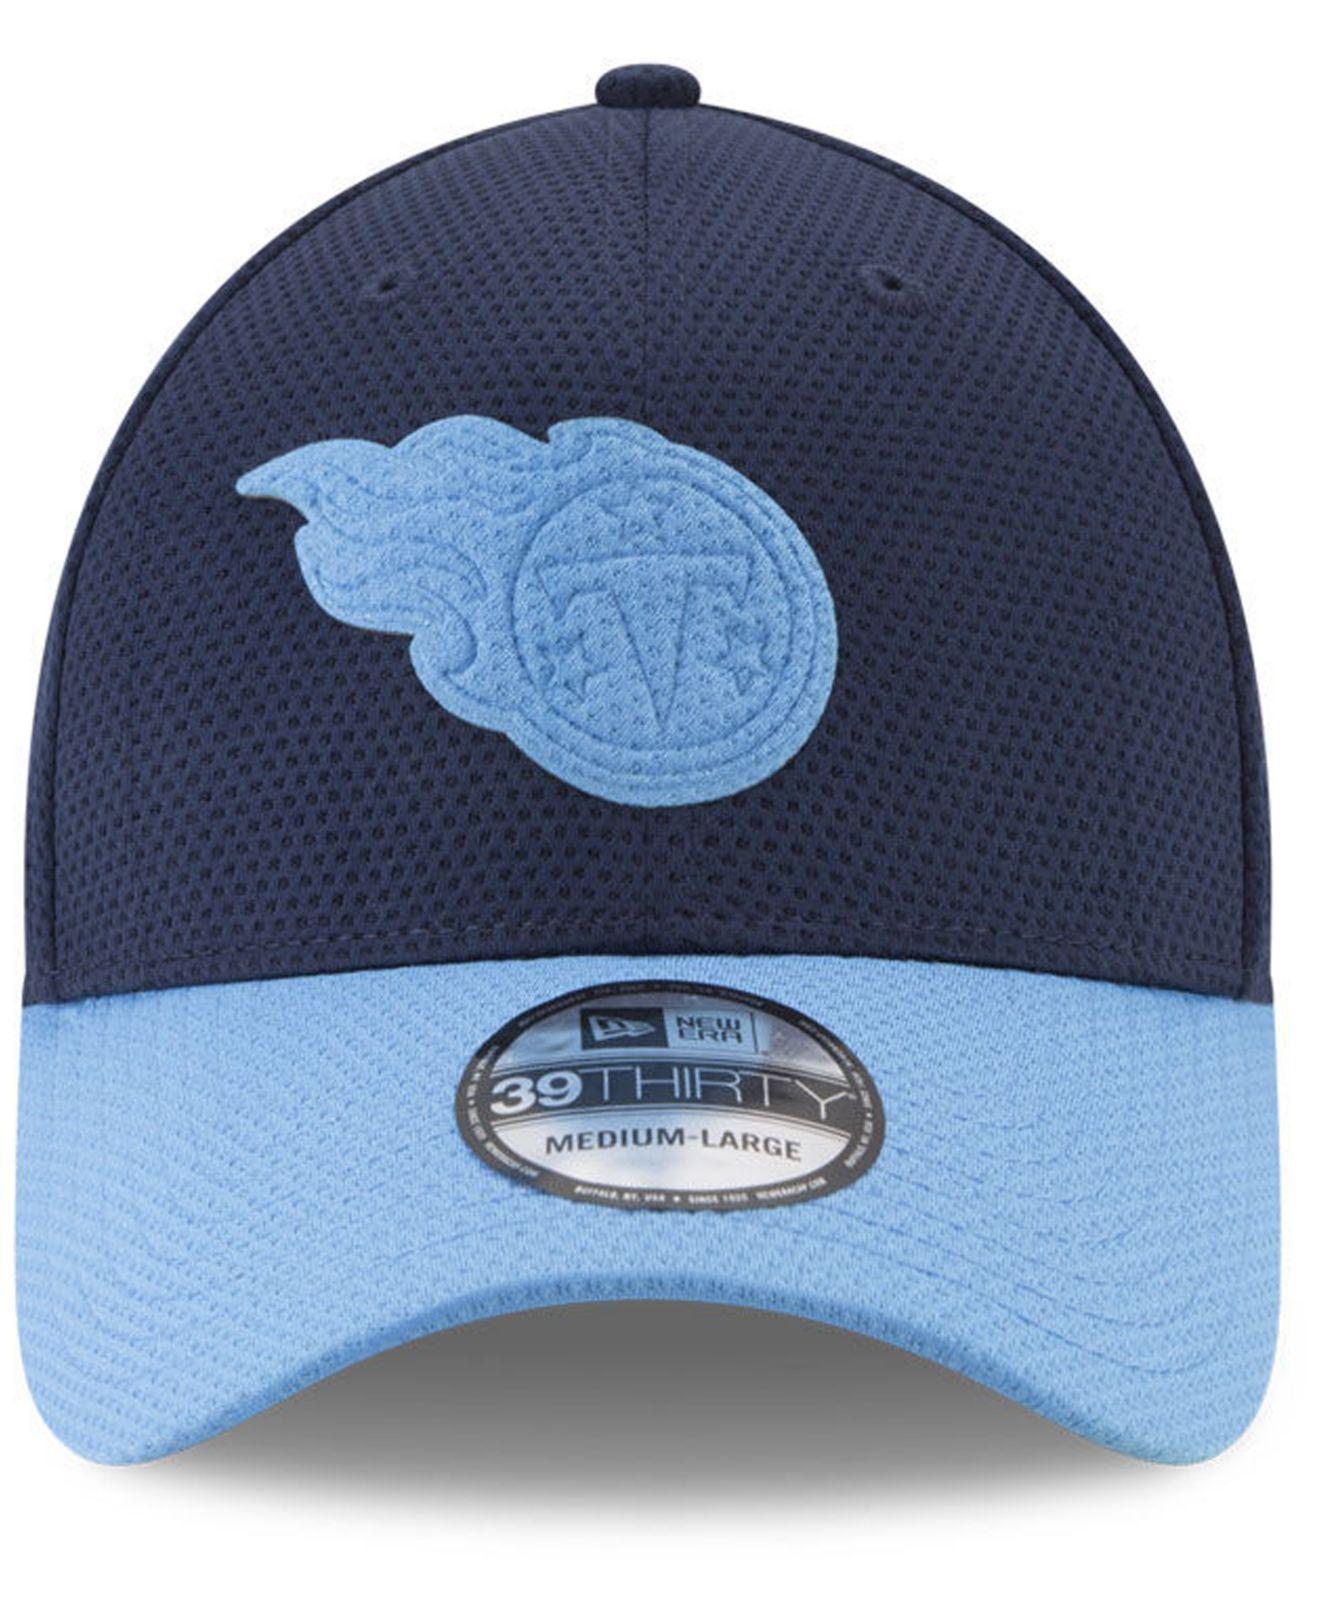 newest b0ae8 57786 australia lyst ktz tennessee titans logo surge 39thirty cap in blue for men  1f314 4f836